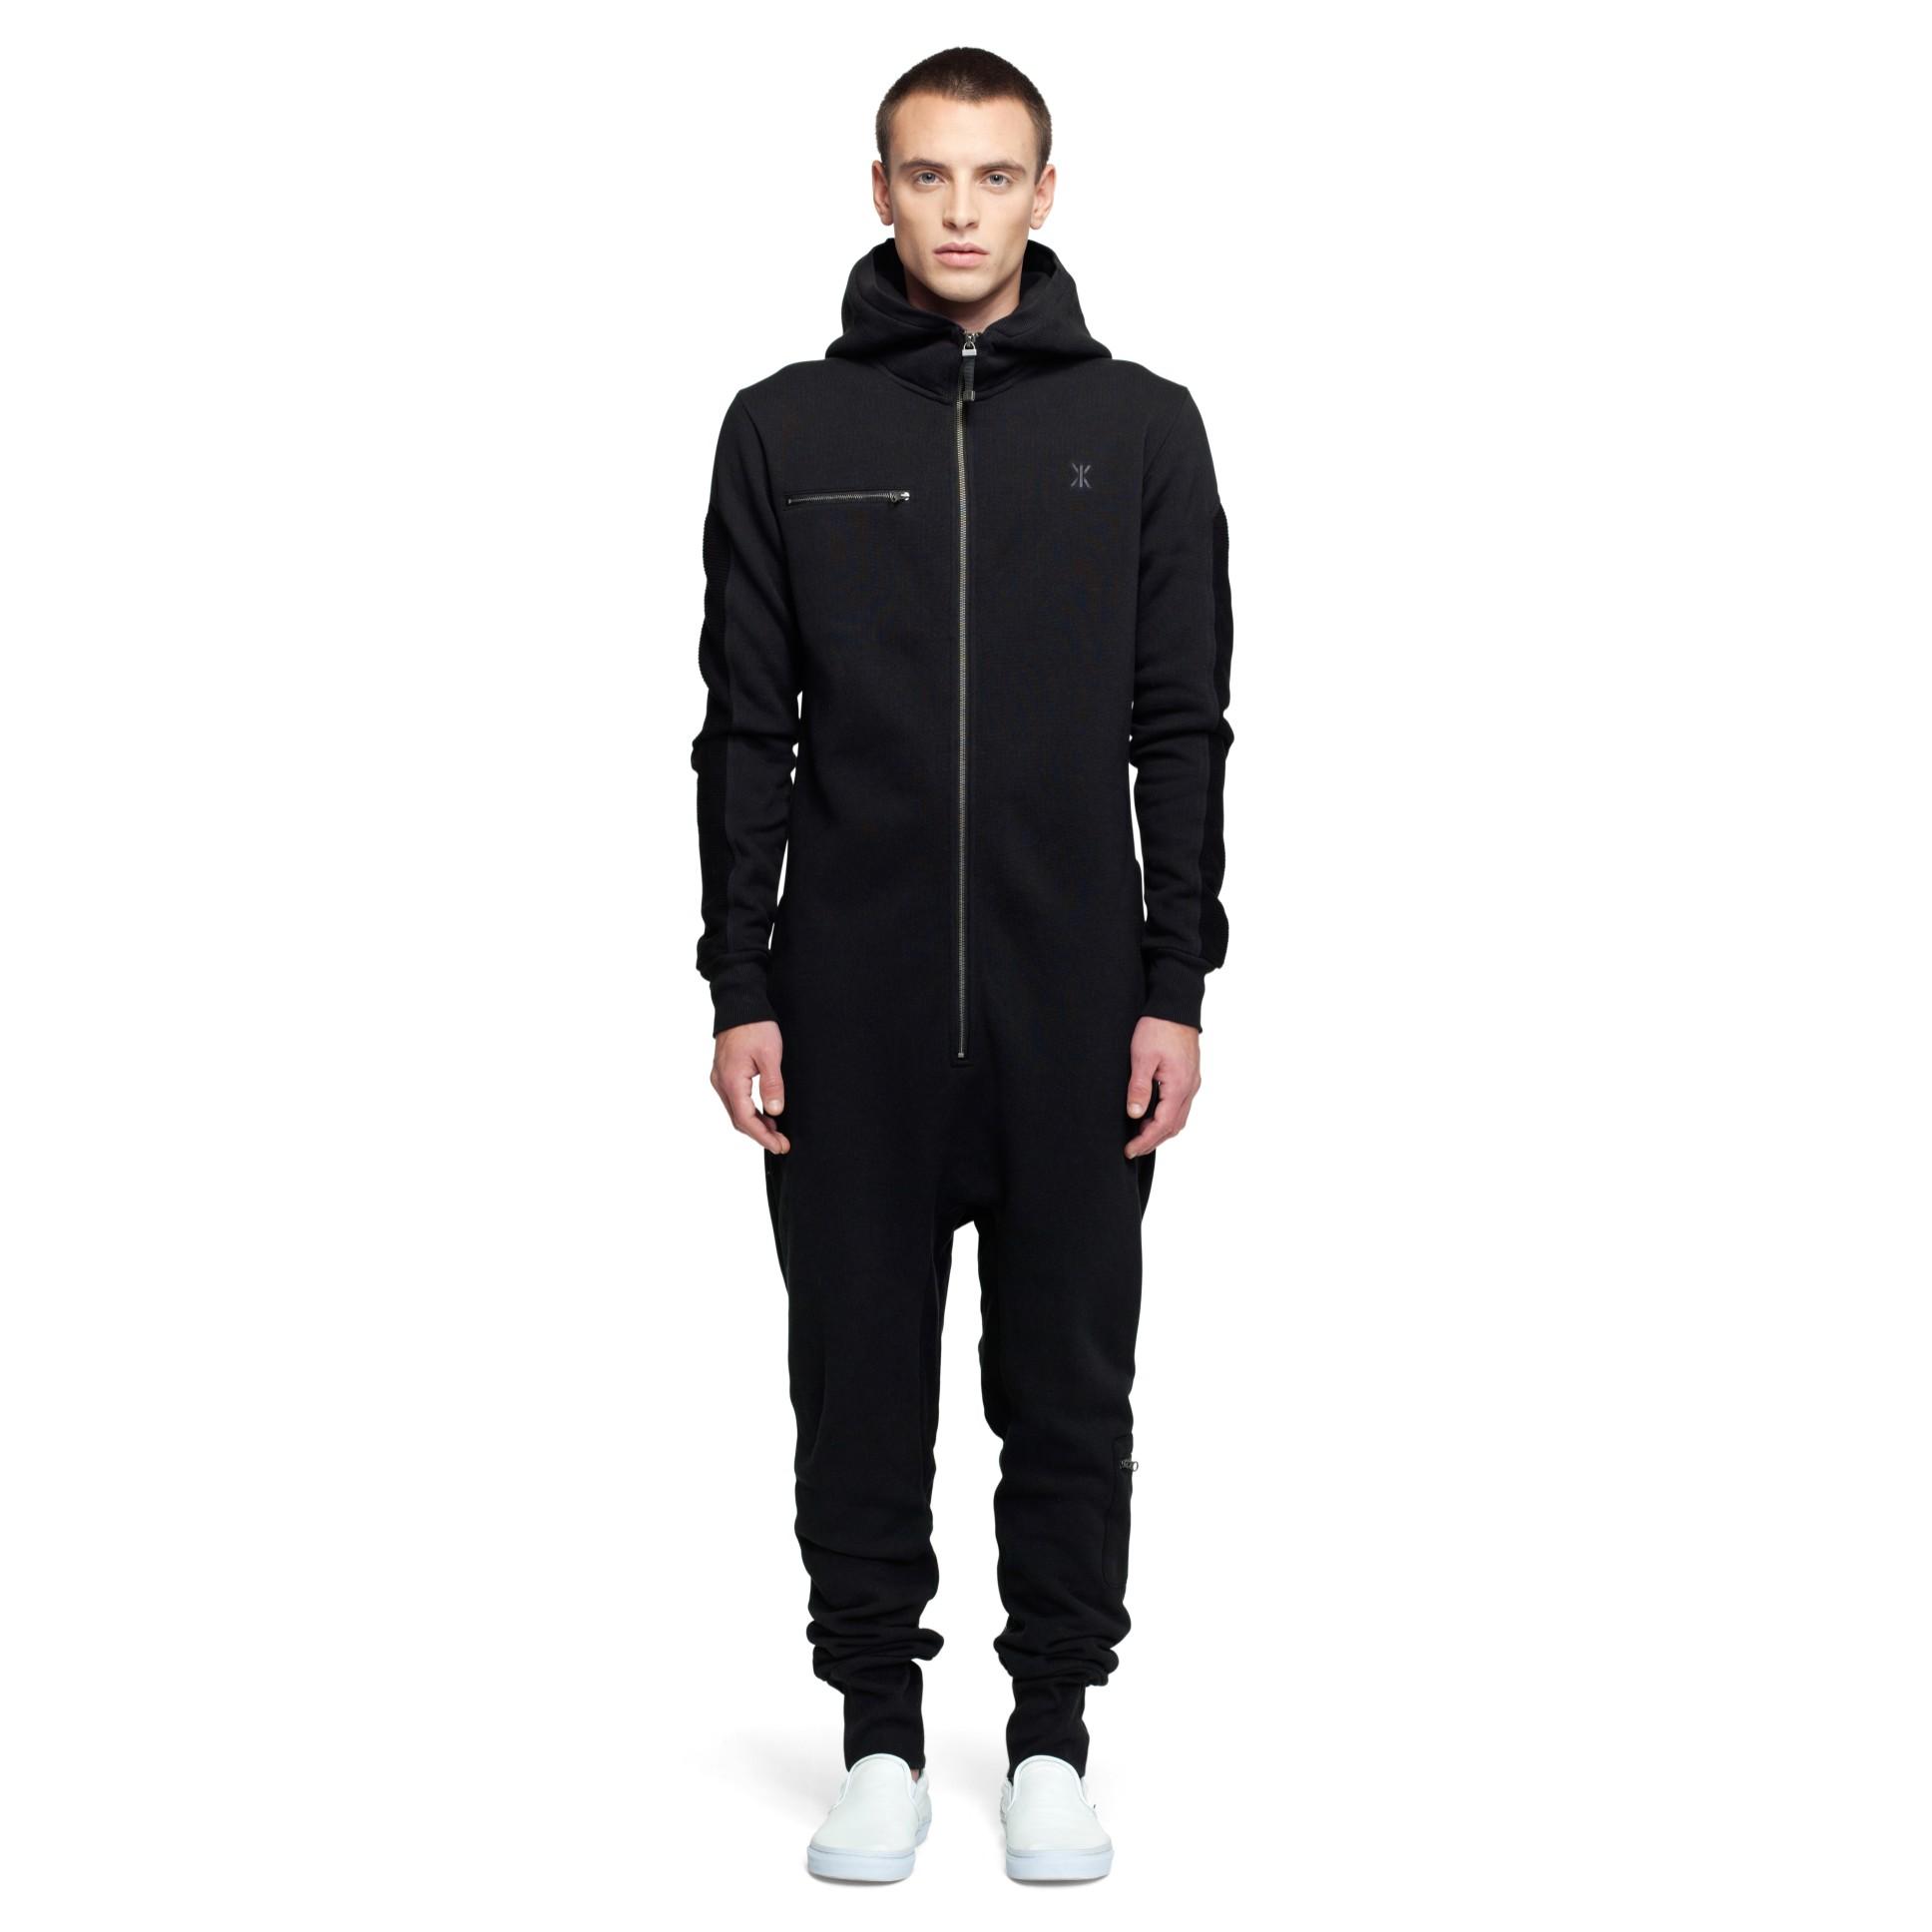 slow jumpsuit black onesie onepiece uk. Black Bedroom Furniture Sets. Home Design Ideas